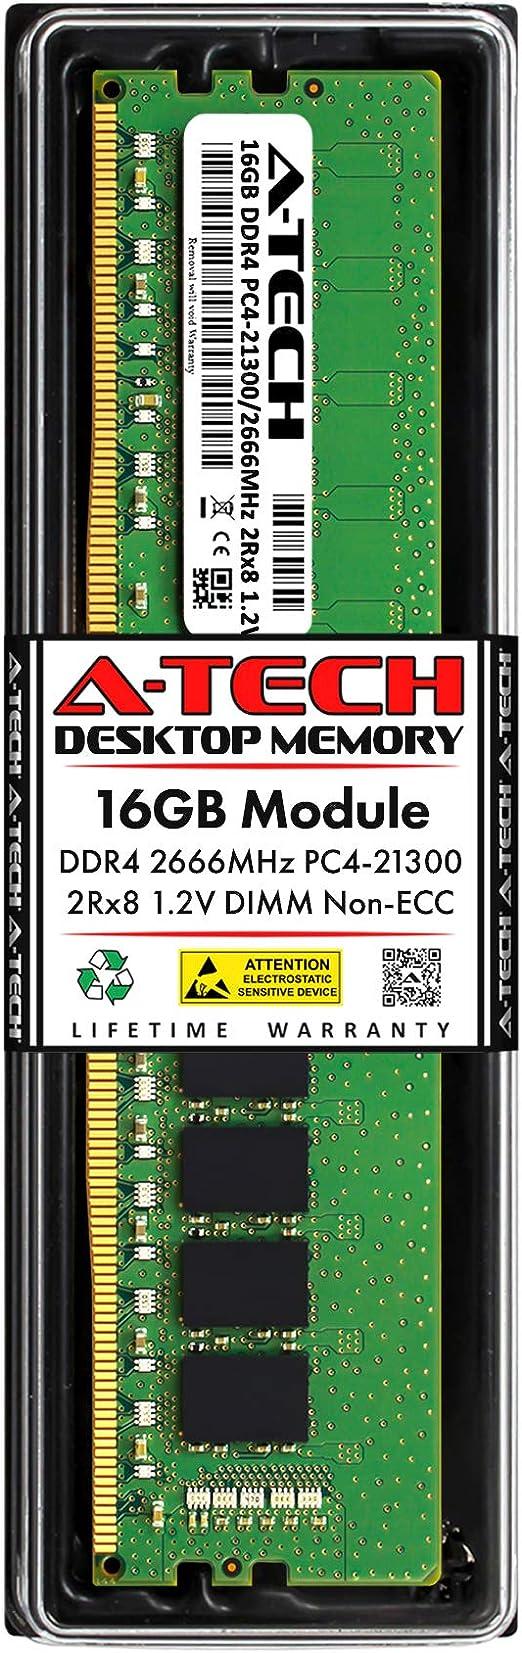 for Intel HNS2600TP24R A-Tech 16GB Kit 2 x 8GB DDR4 PC4-21300 2666Mhz ECC Registered RDIMM 1rx8 Server Memory Ram AT370322SRV-X2R1